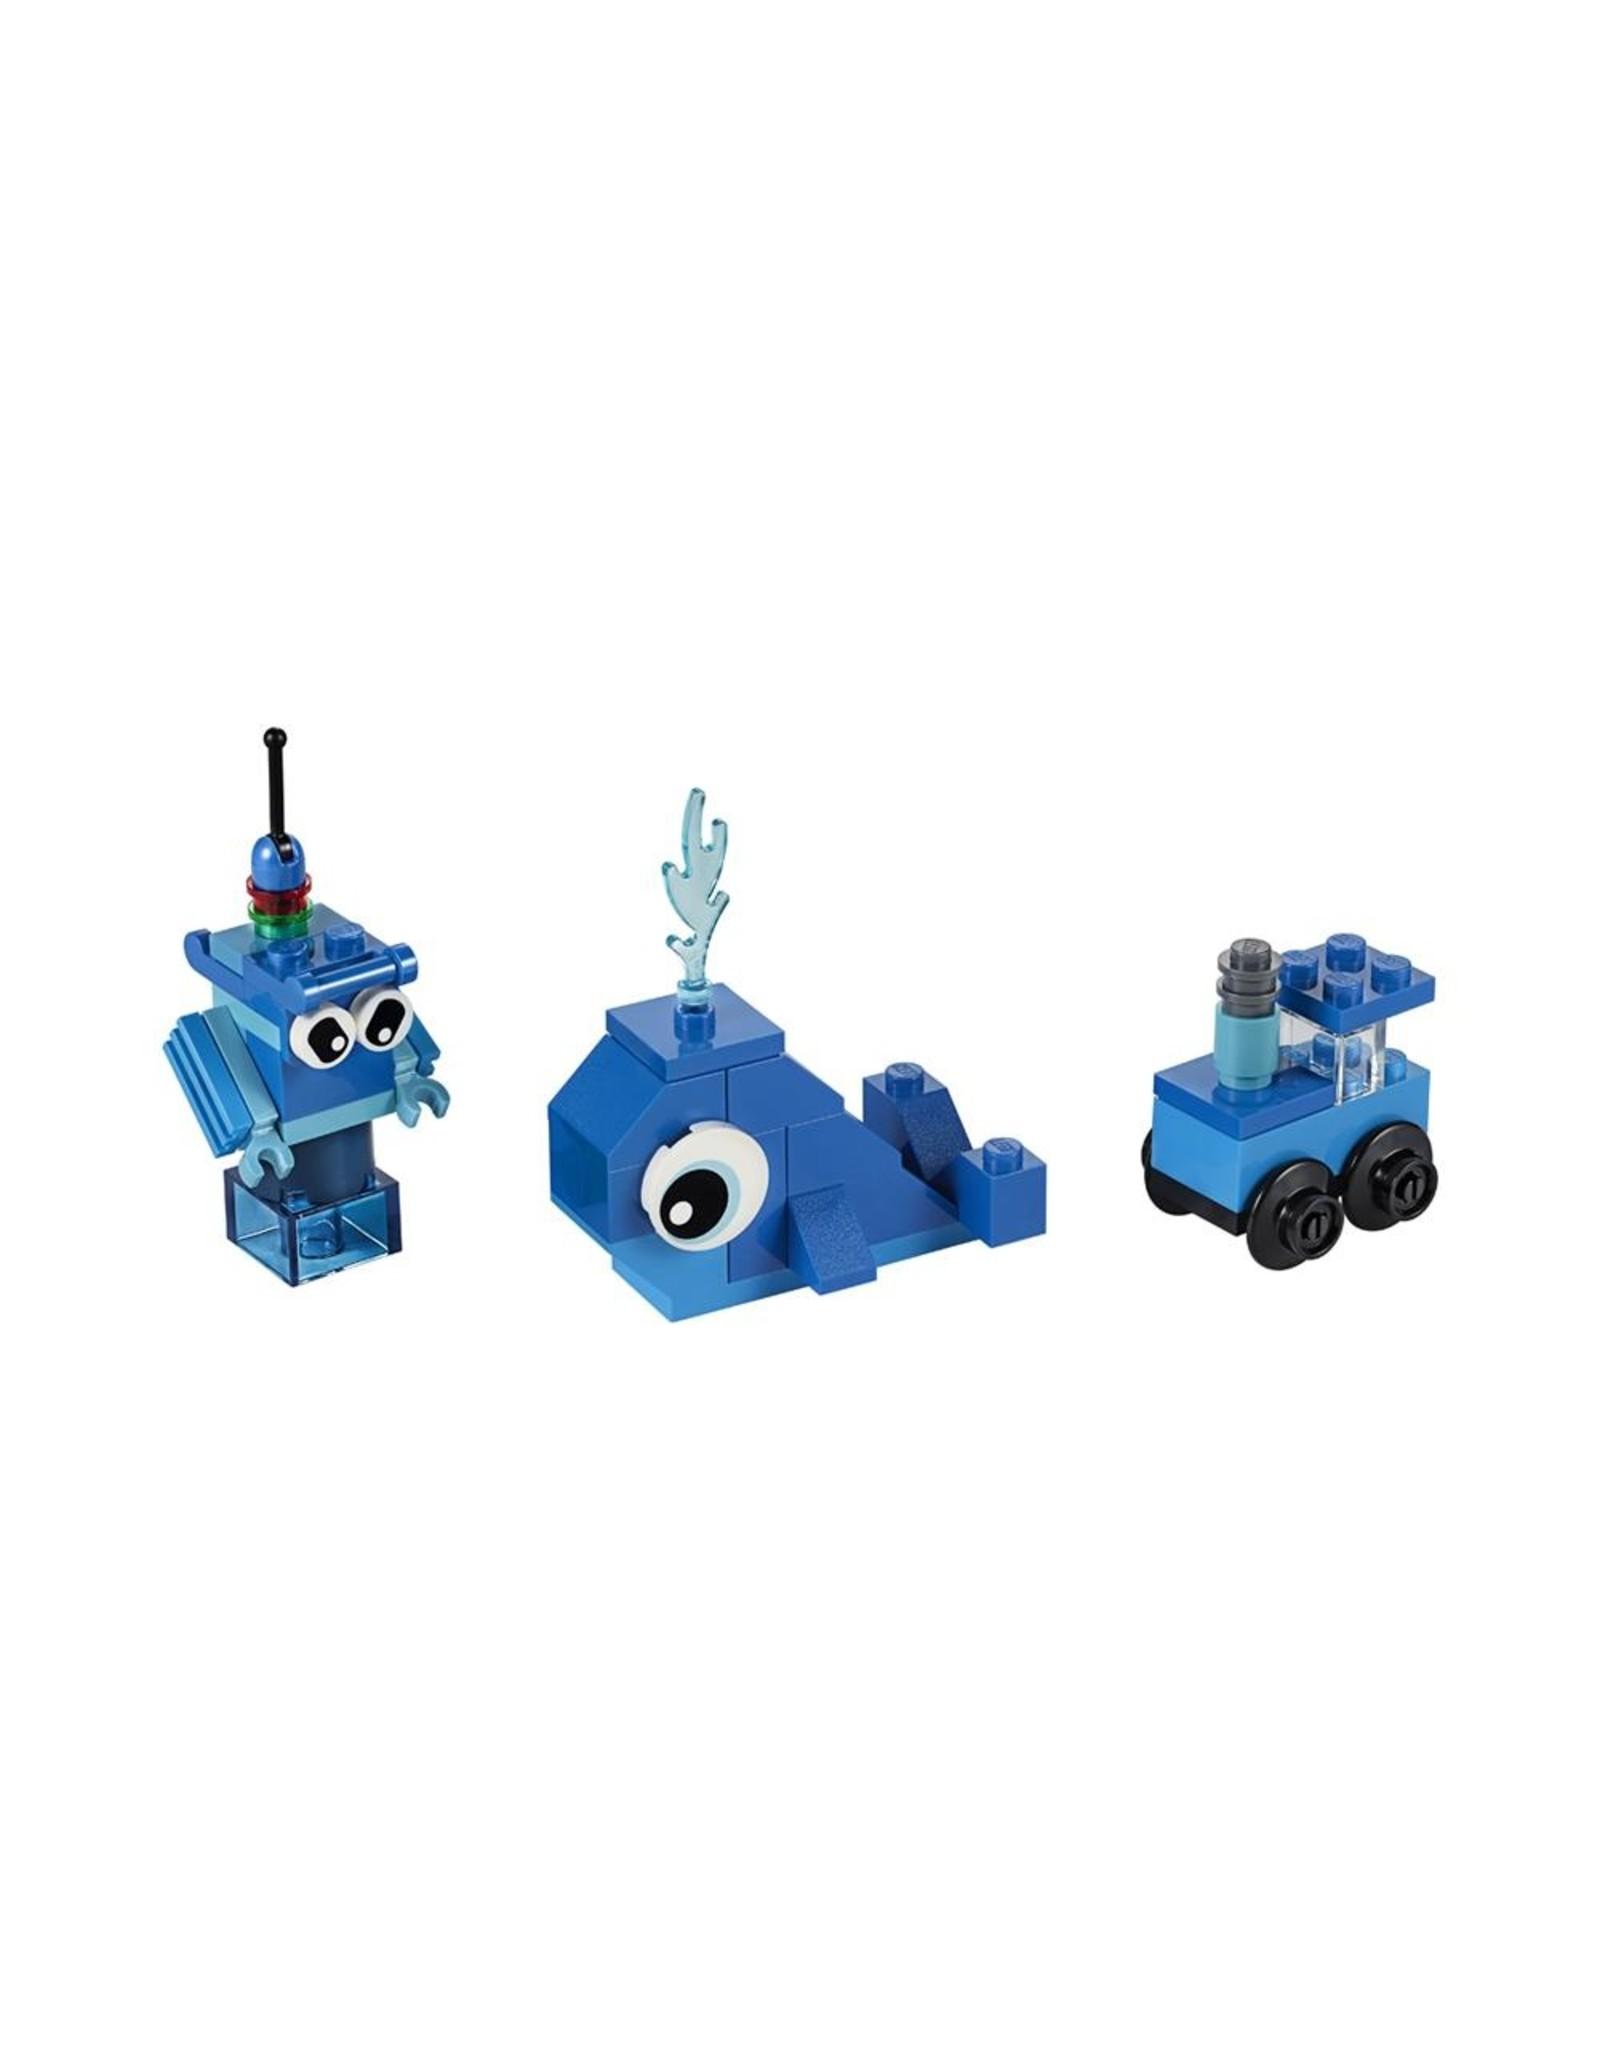 LEGO Lego Classic 11006 Creative Blue Bricks